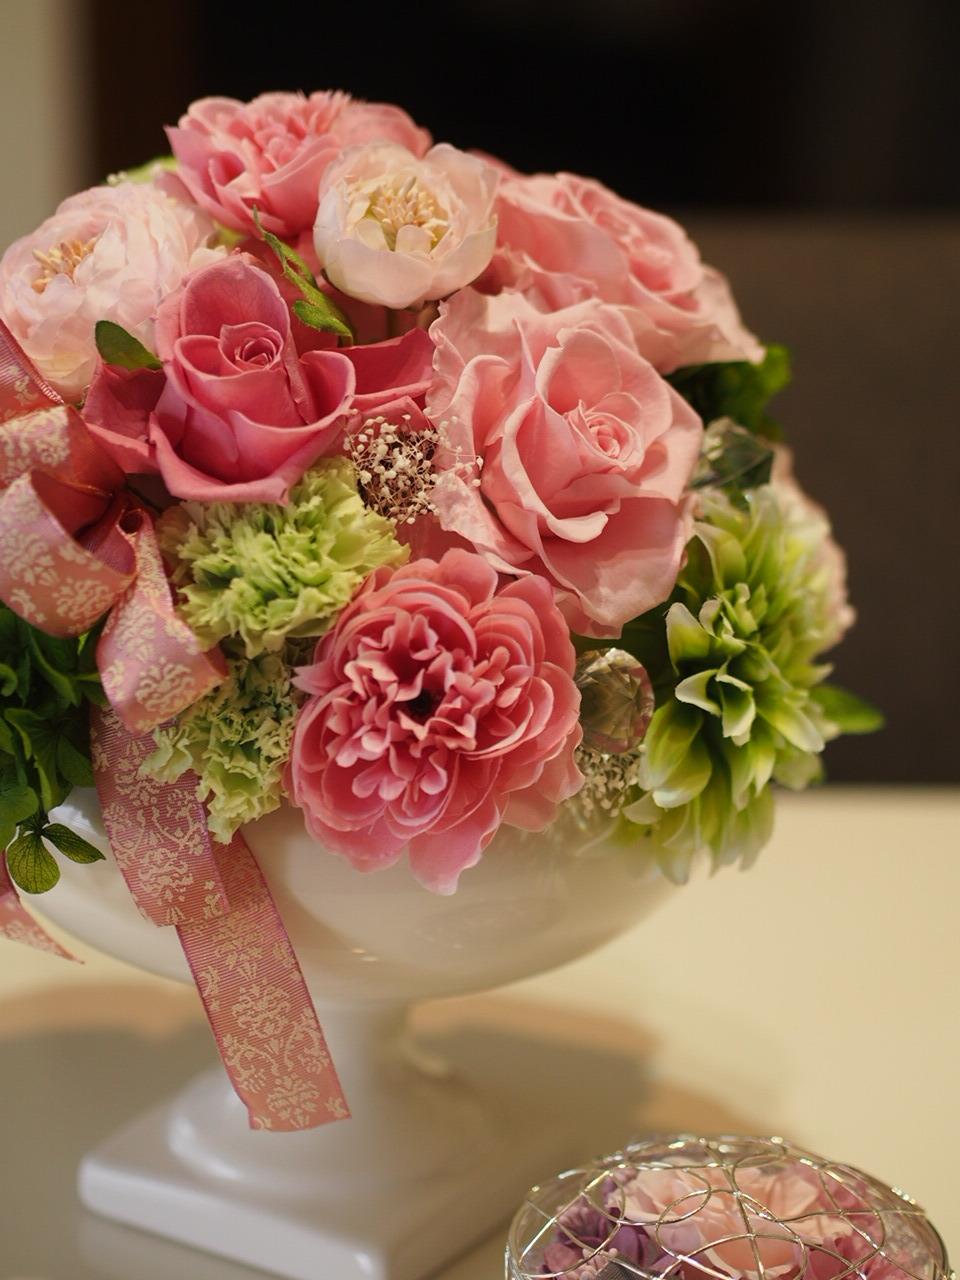 【Pink/Gift】_d0144095_18035983.jpg